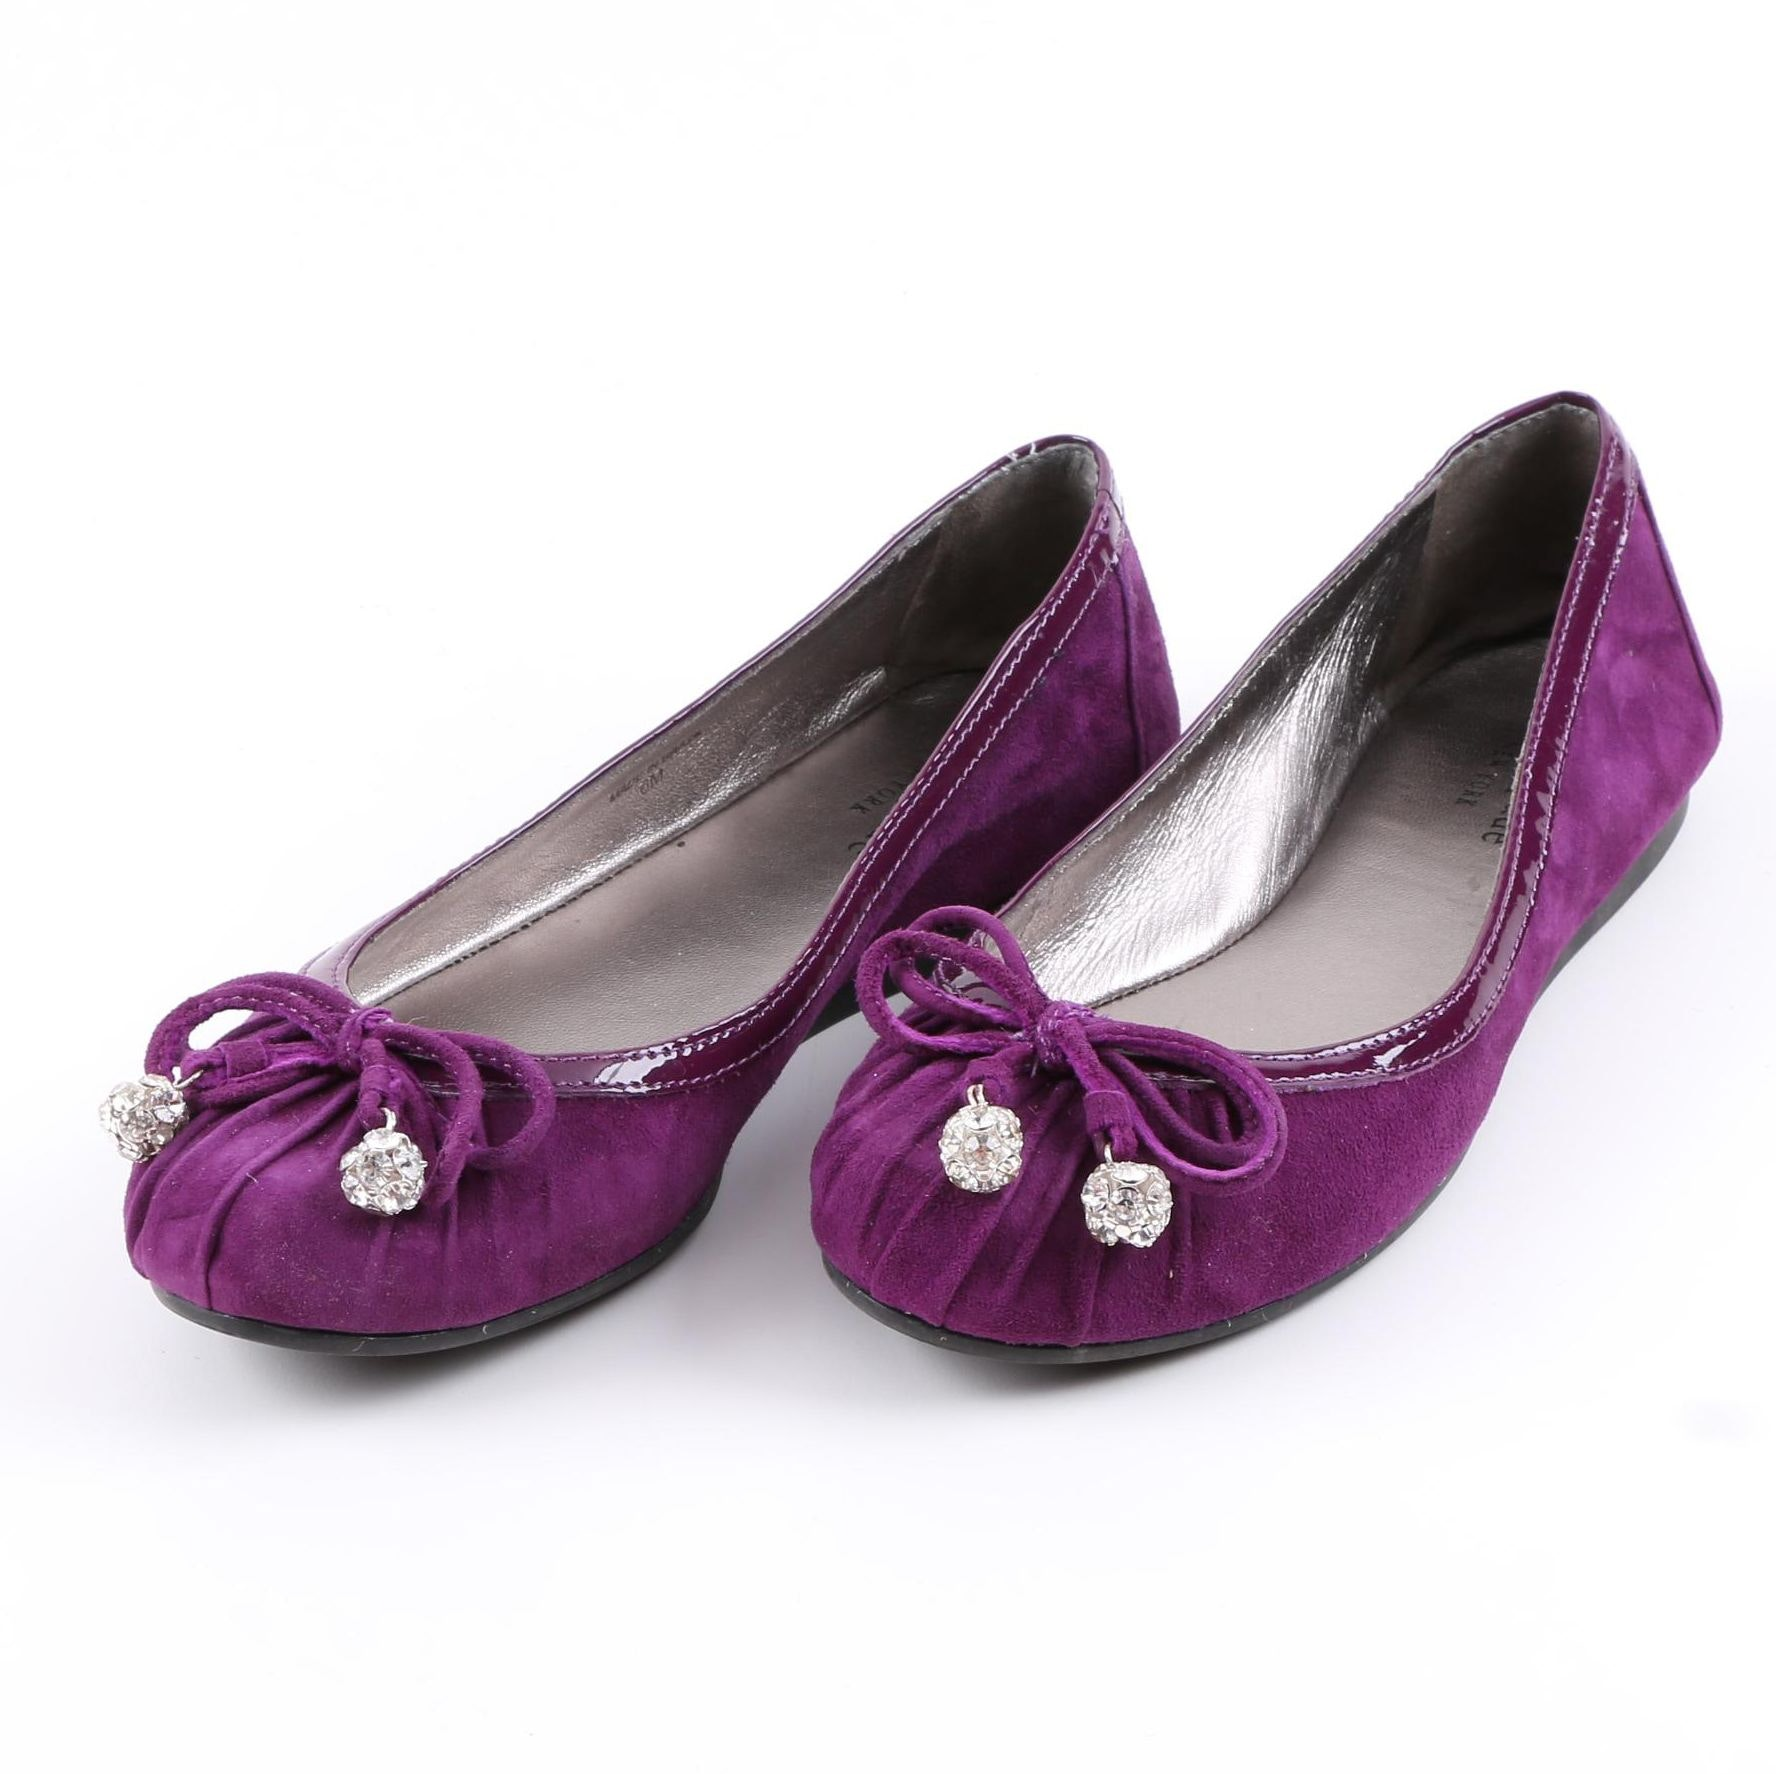 Kate Spade Purple Ballet Flats